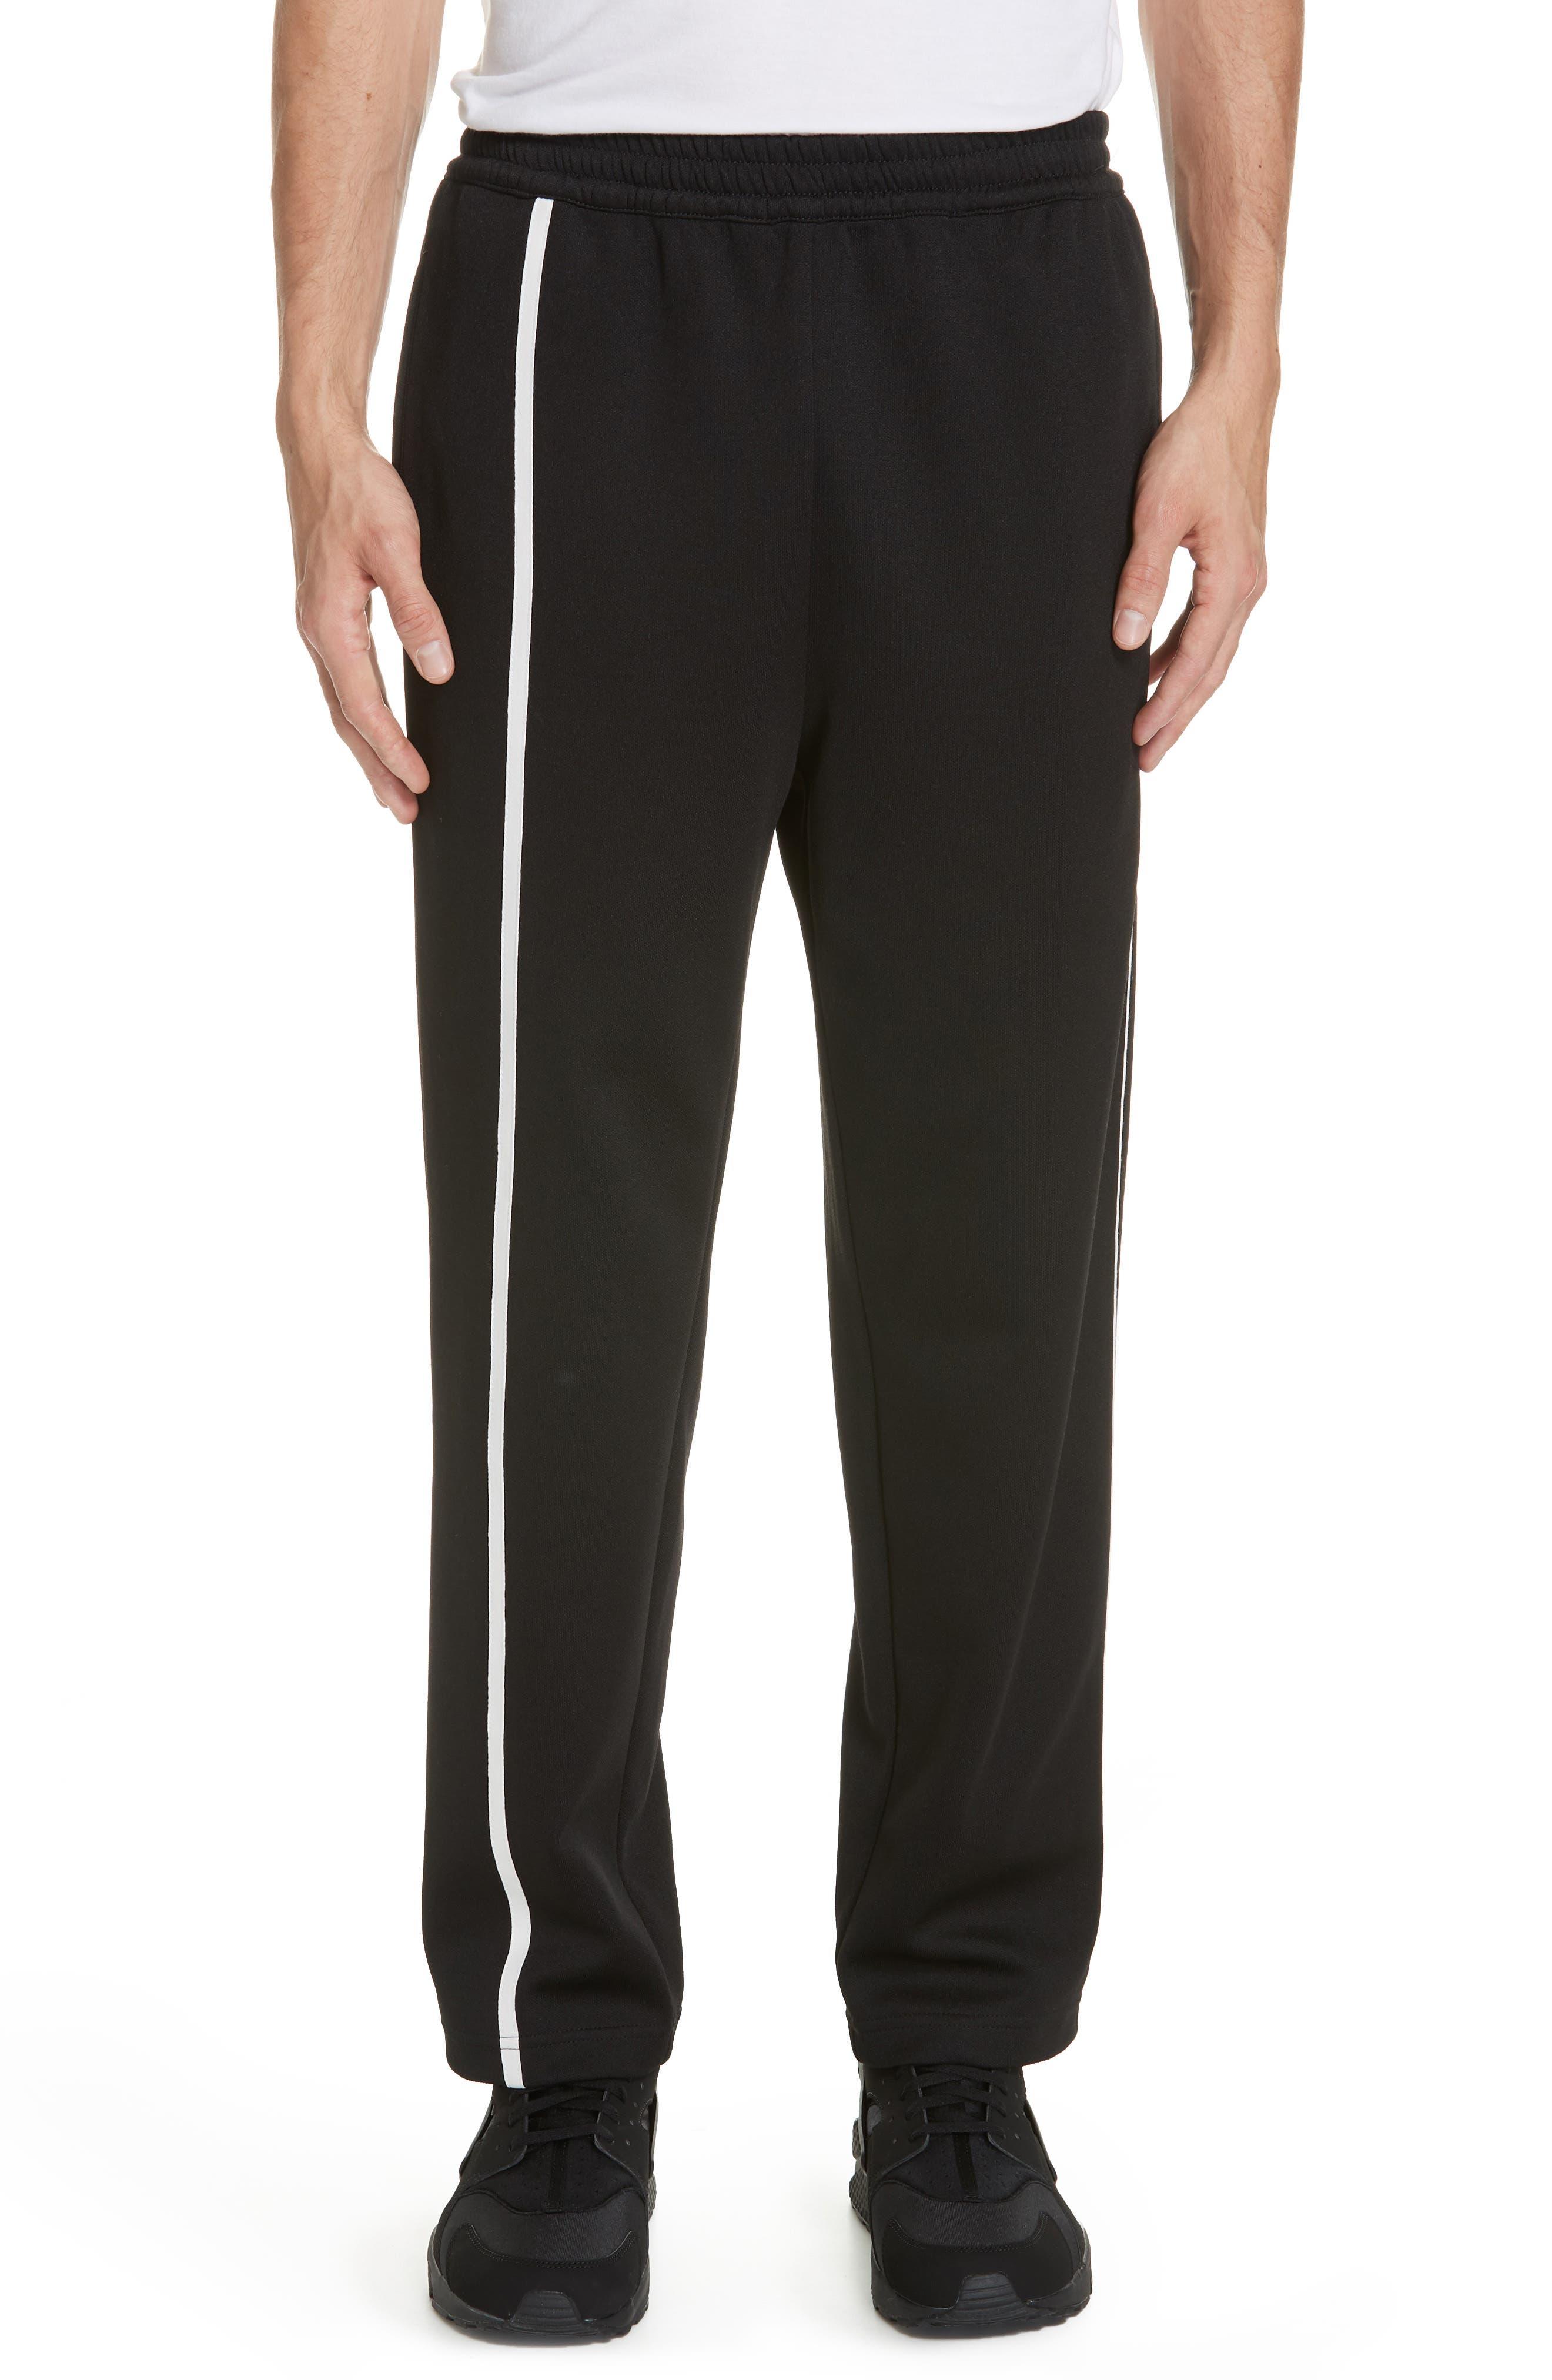 HELMUT LANG Sport Stripe Sweatpants, Main, color, BLACK AND WHITE